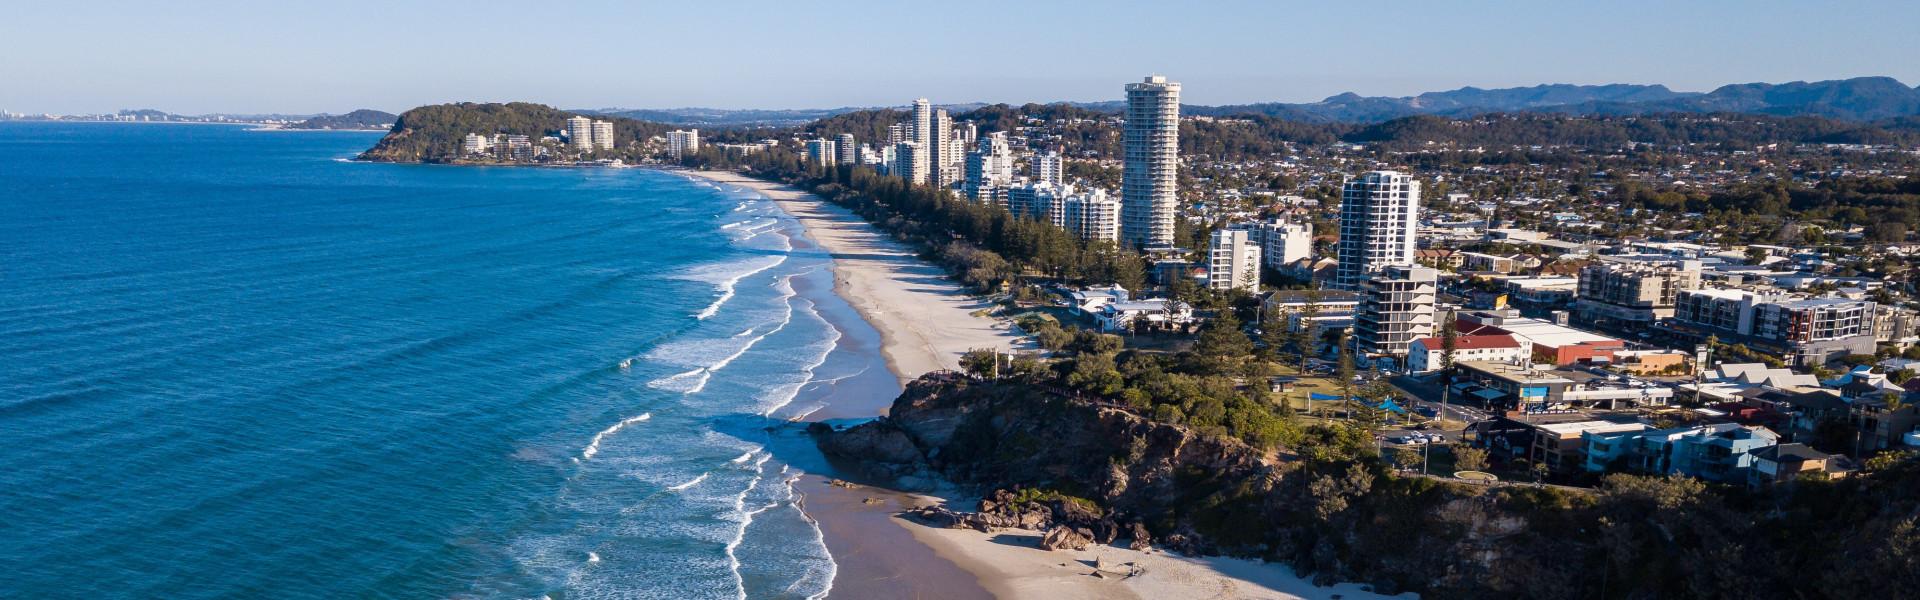 Destination image of Australie